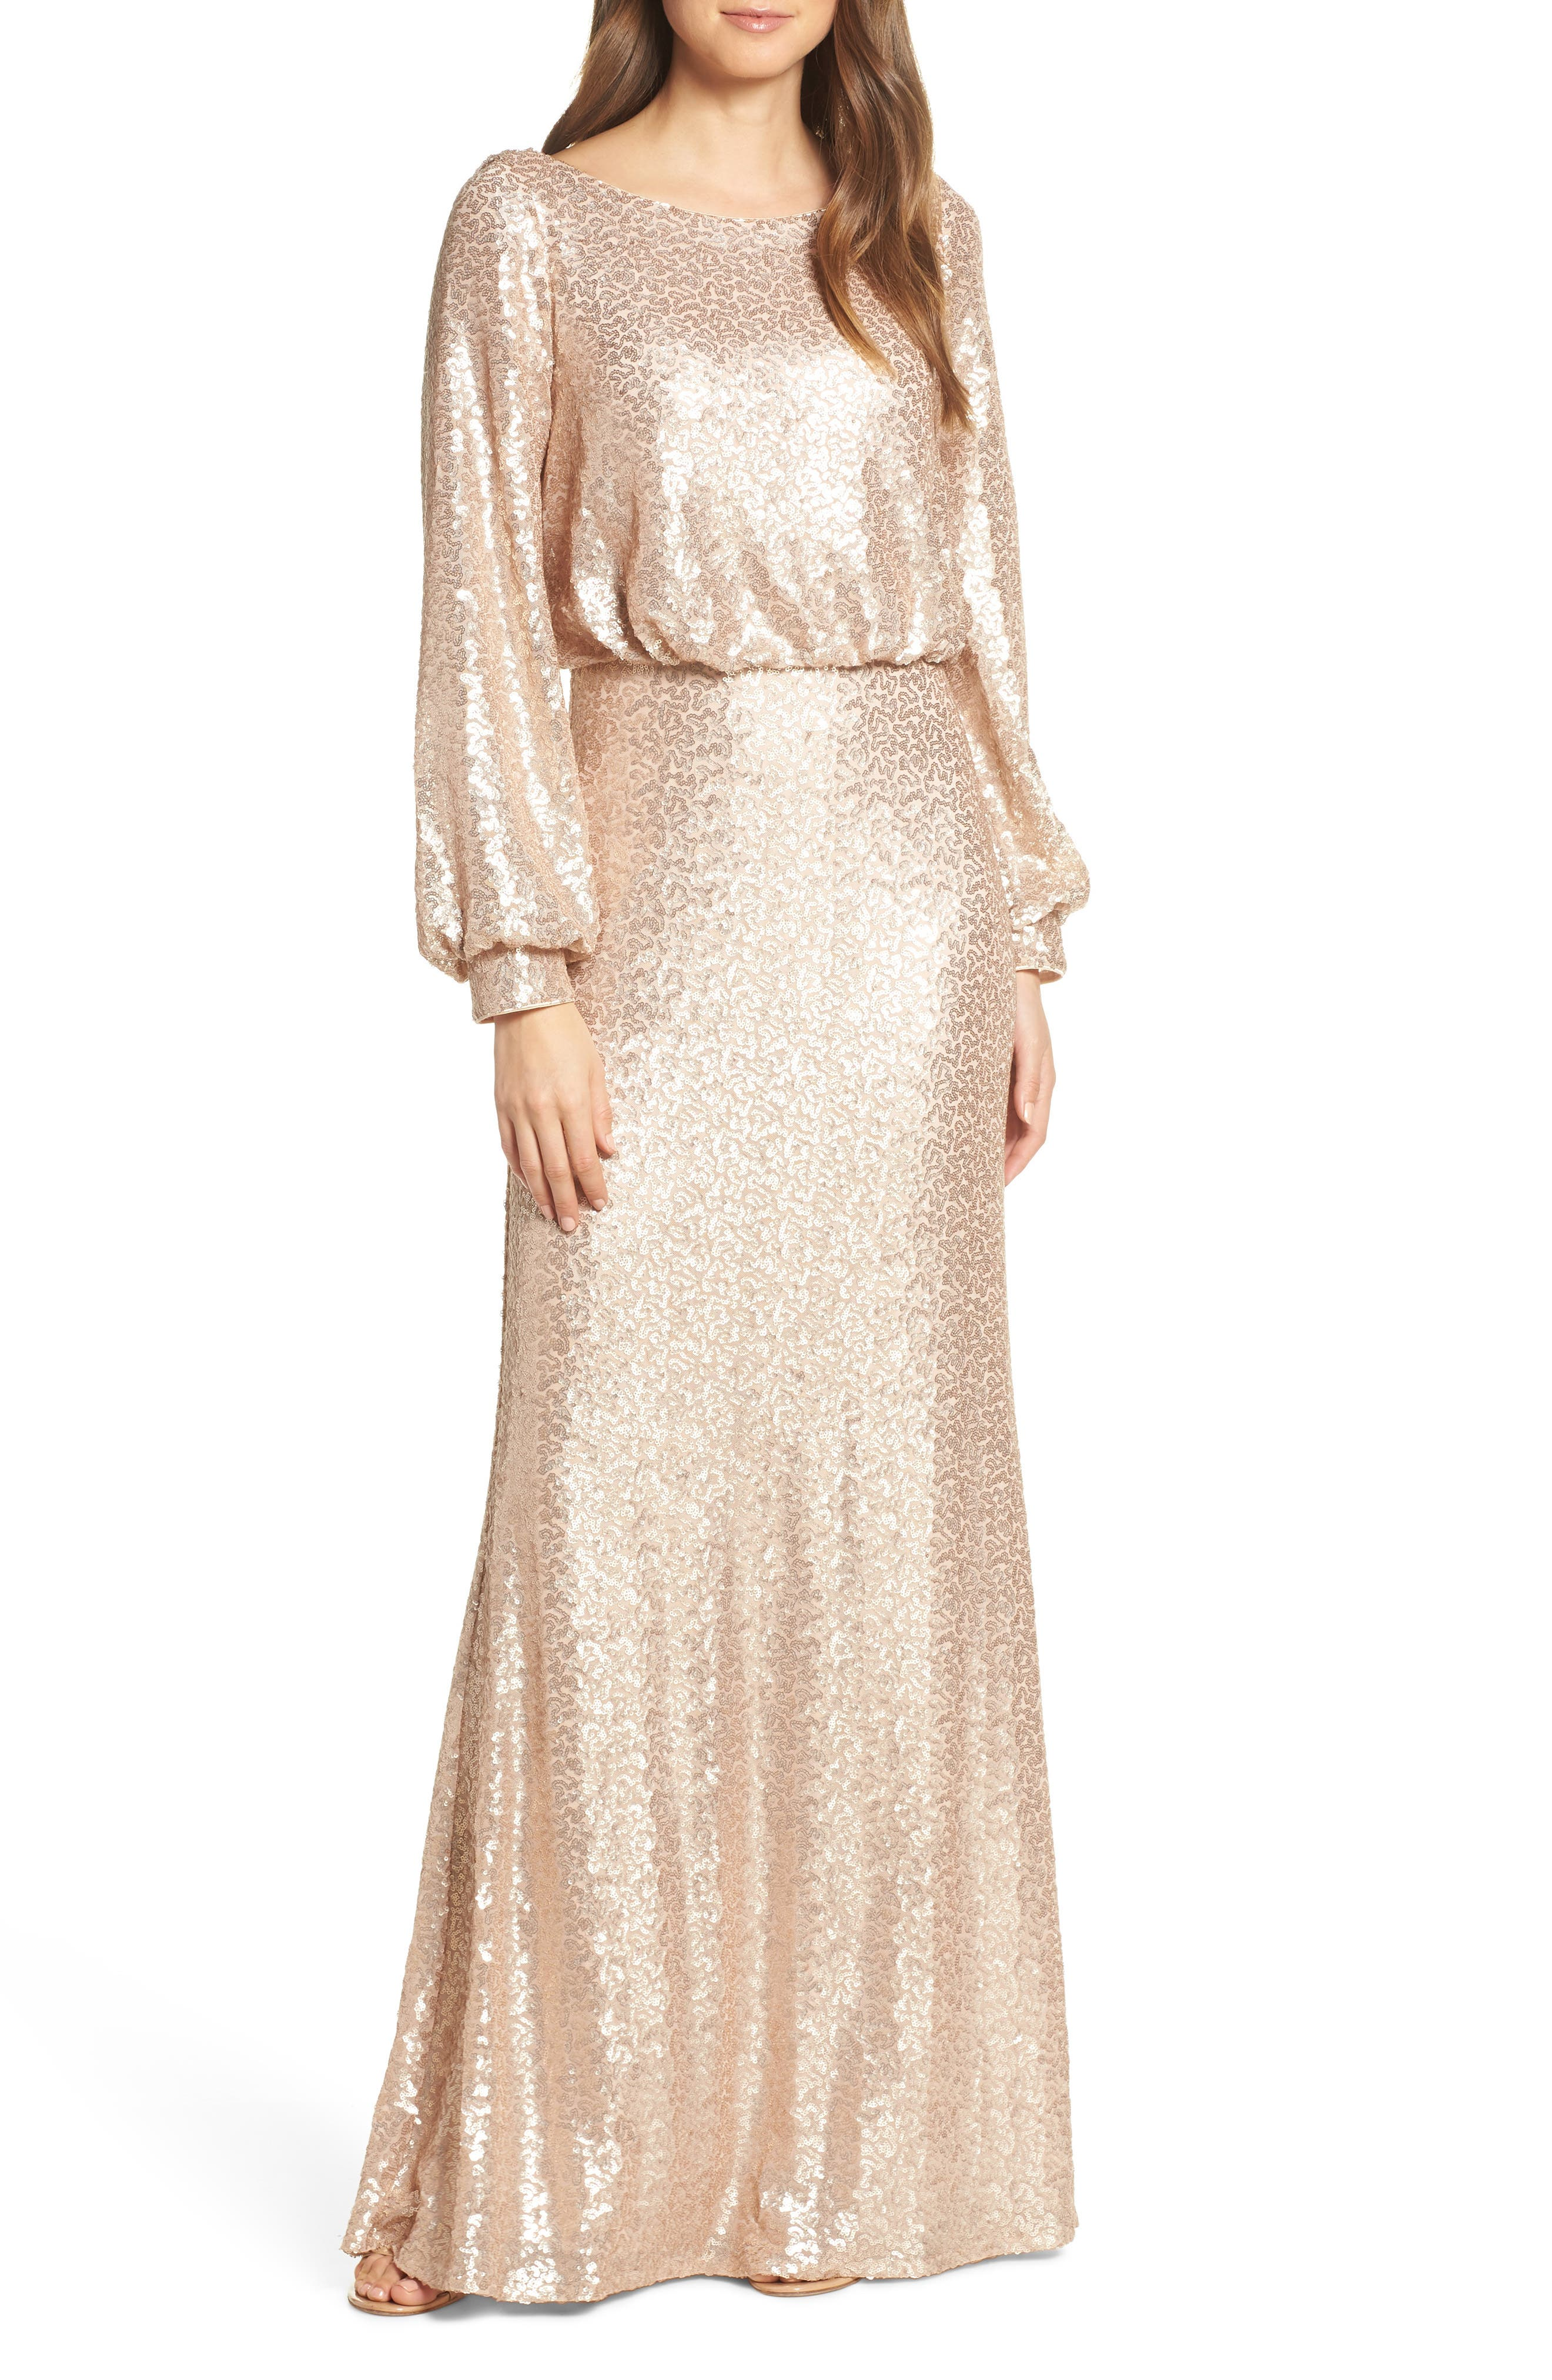 70s Prom, Formal, Evening, Party Dresses Womens Tadashi Shoji Blouson Long Sleeve Sequin Evening Dress Size XX-Small - Beige $468.00 AT vintagedancer.com